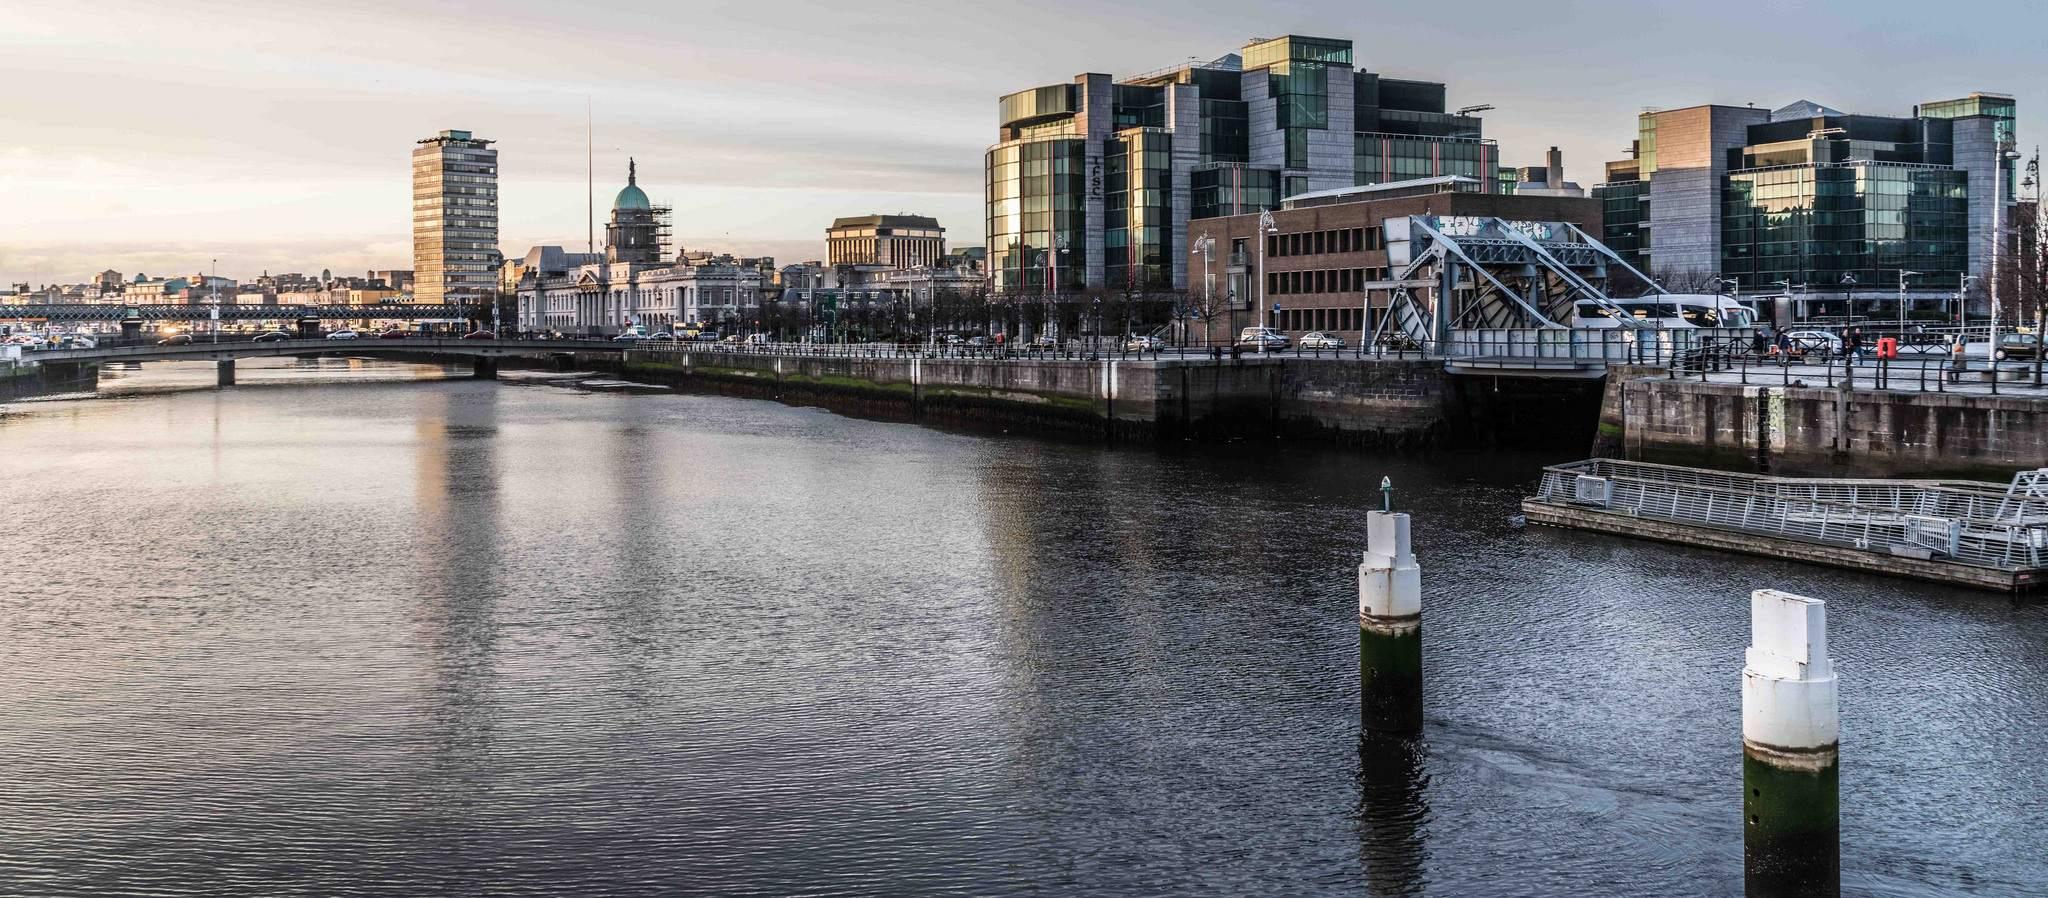 dublin docklands4 Walking Around Dublin Docklands by Marphy